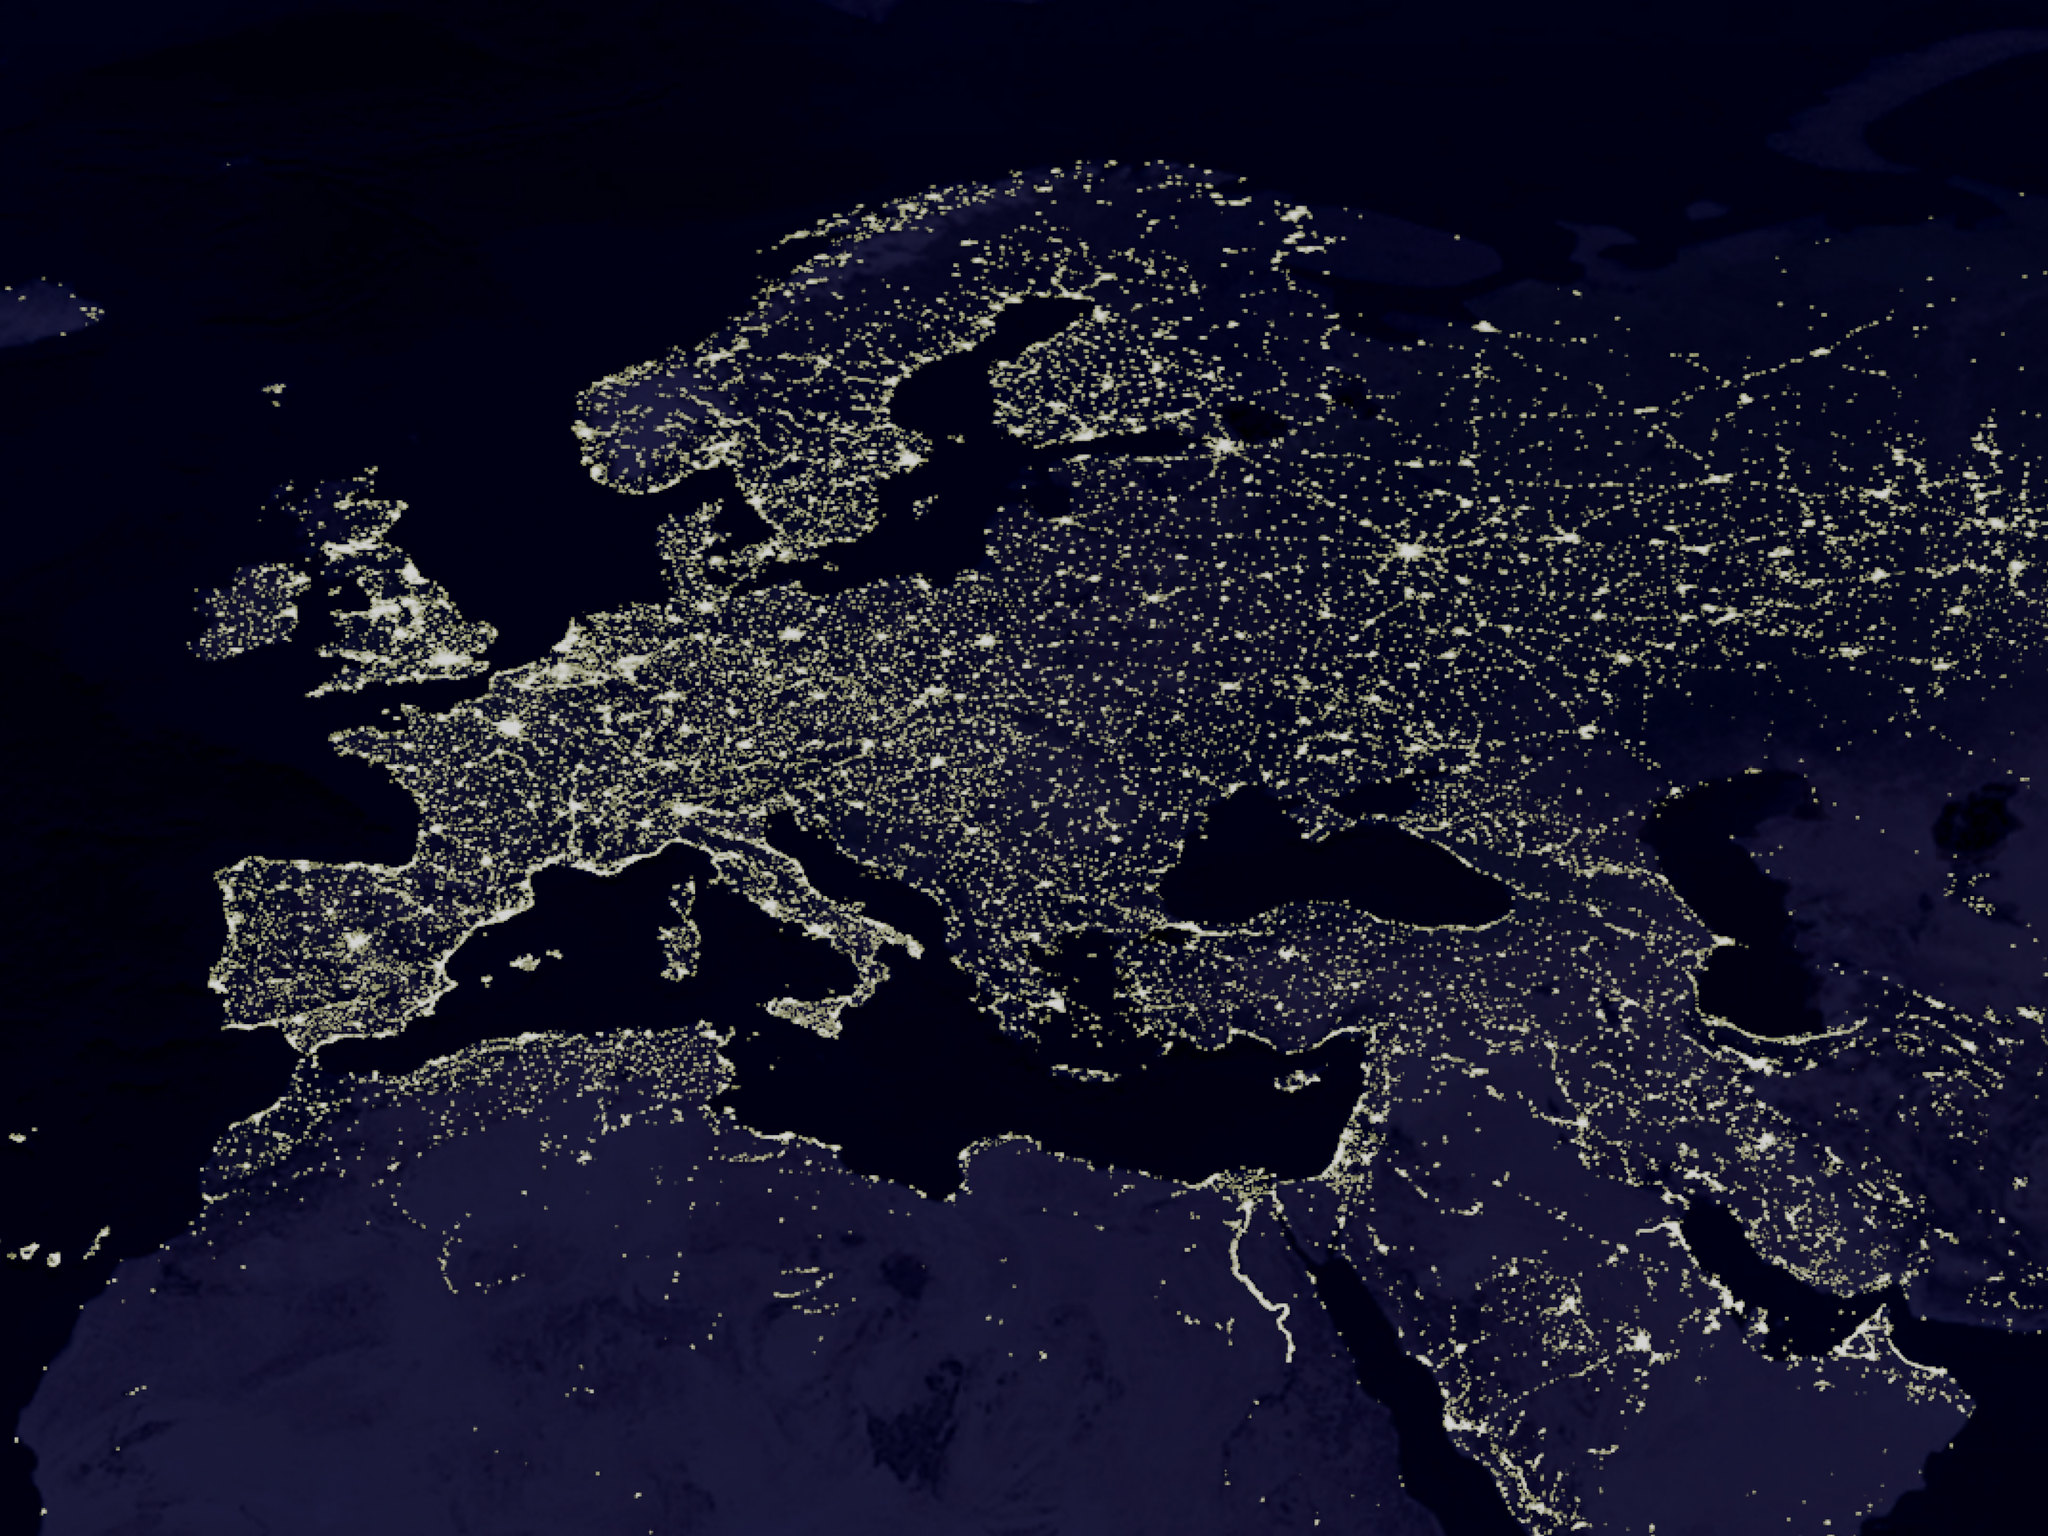 The Night Lights of Europe